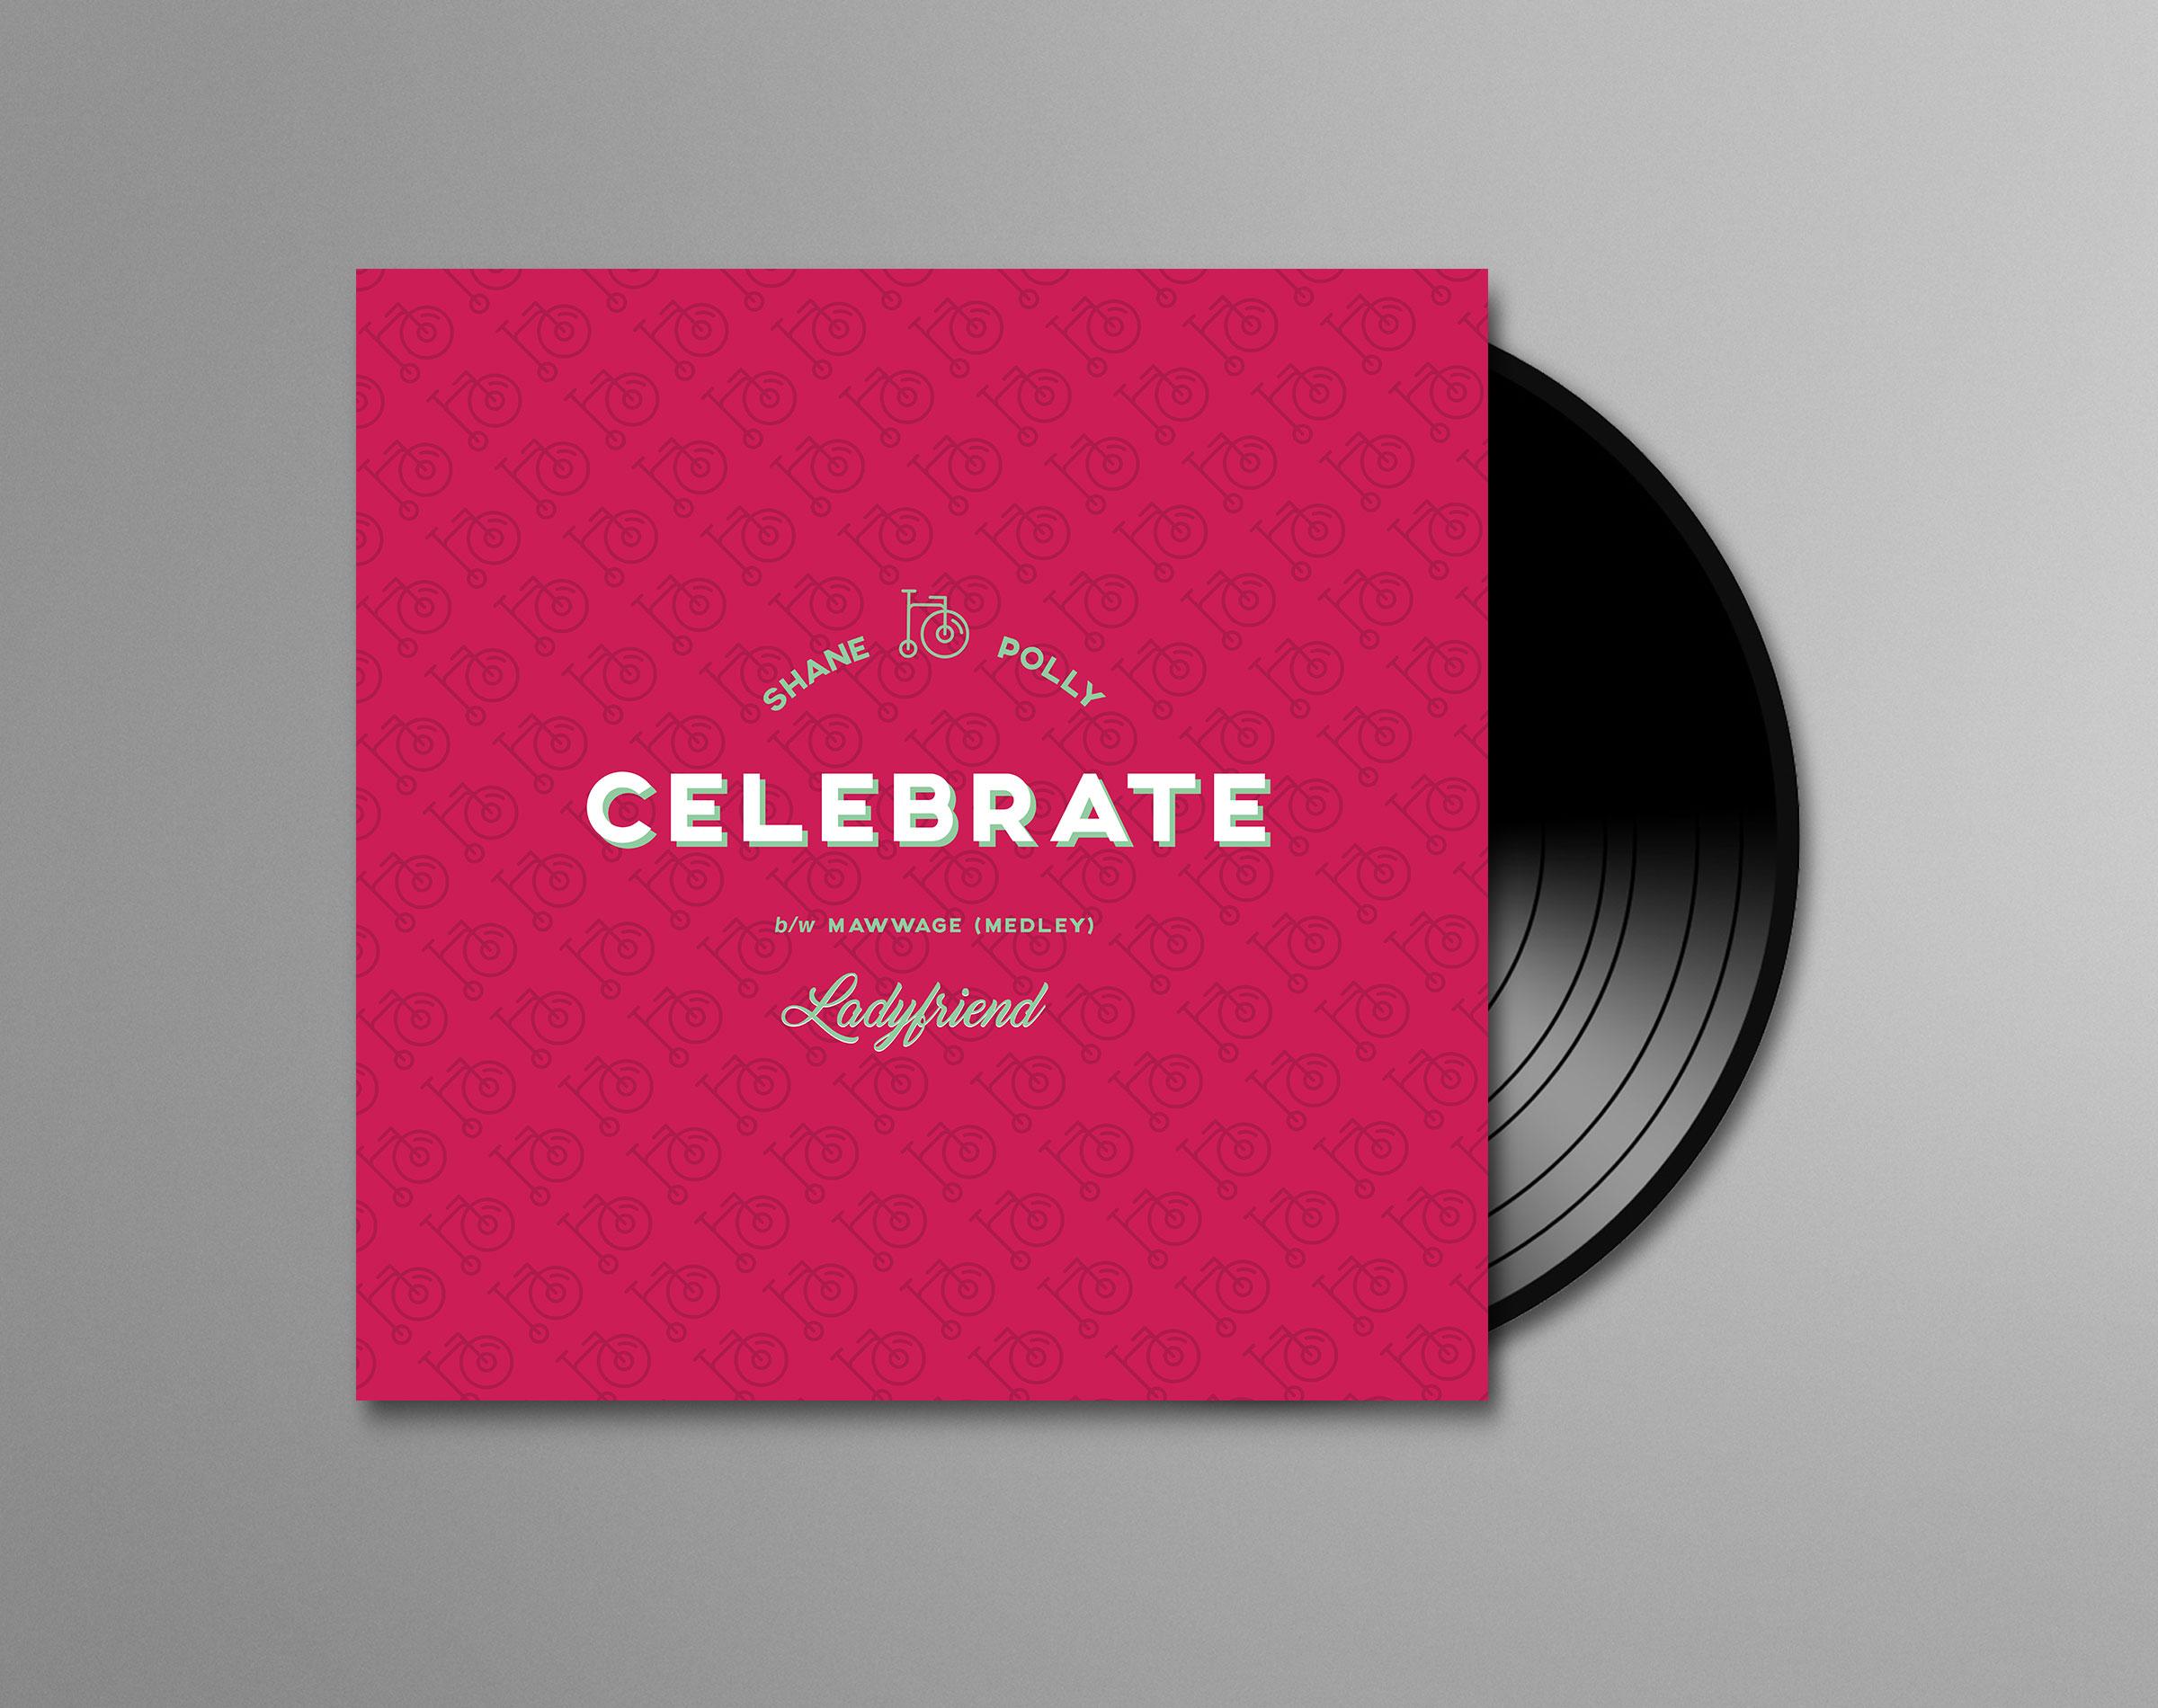 Celebrate_Front_01.jpg